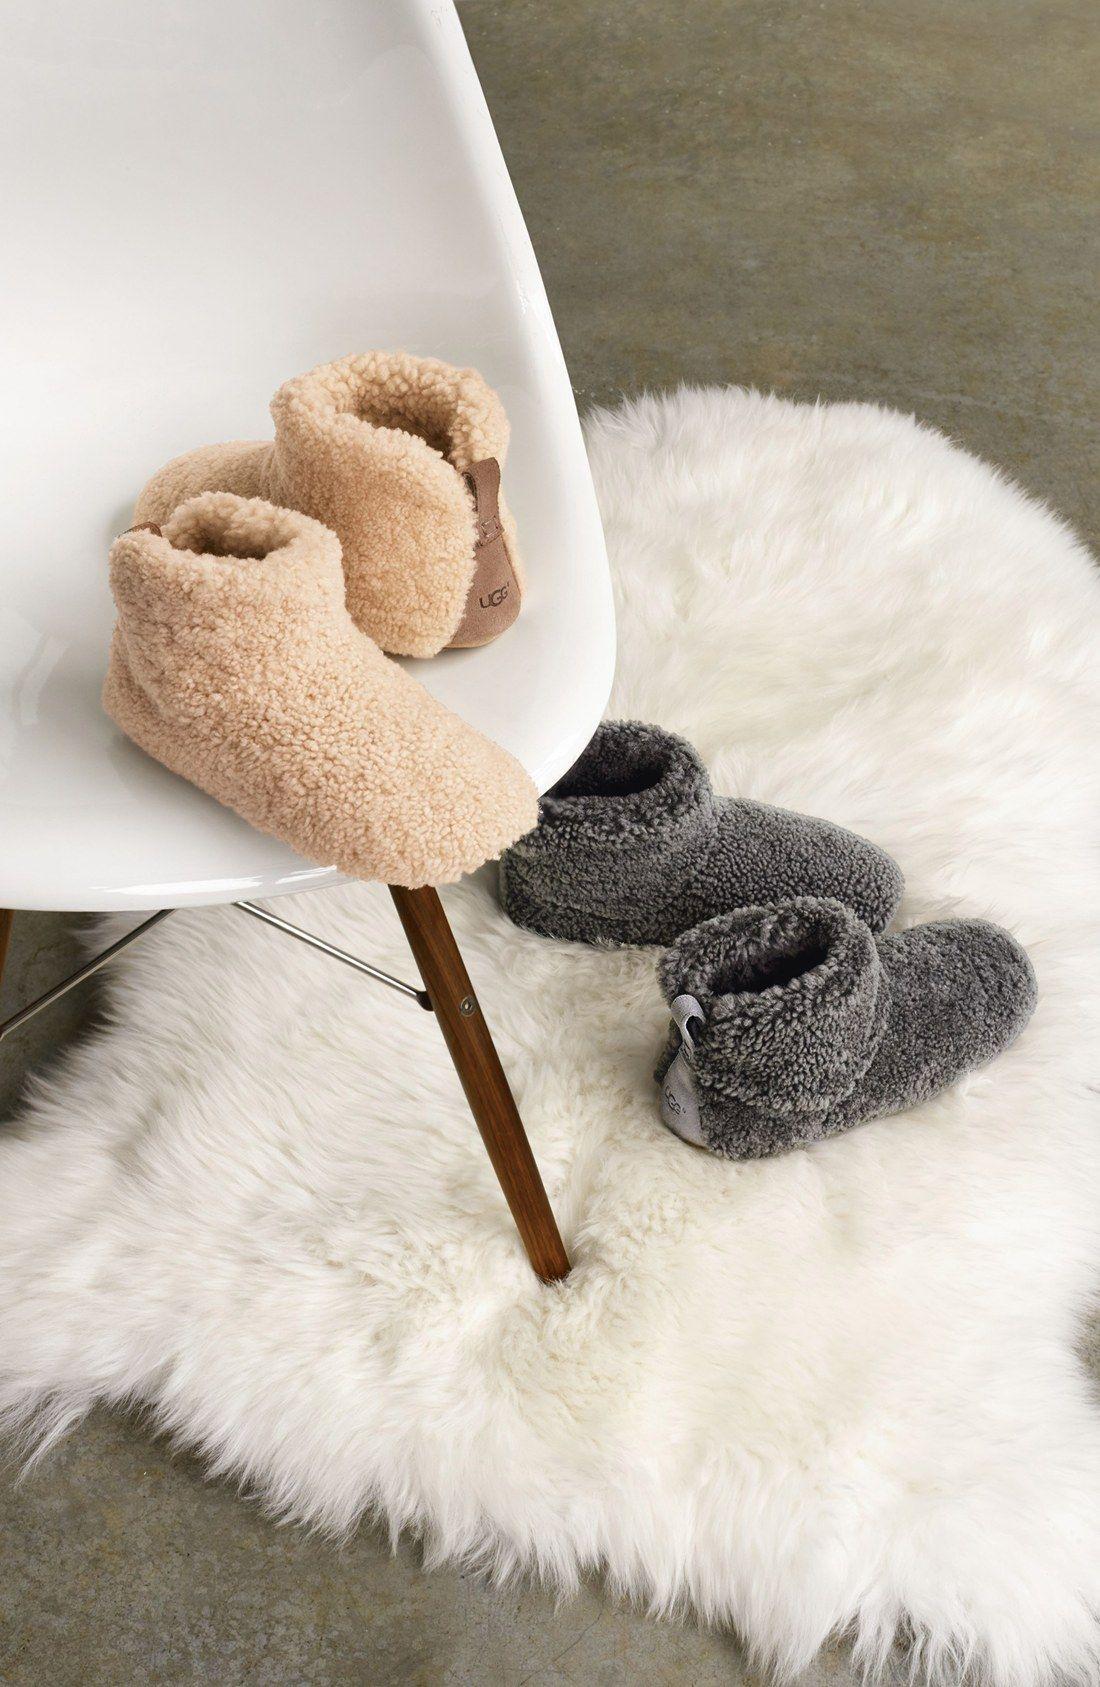 6a5cedf0812 UGG Slippers - OMGosh I need these | G I F T G U I D E | Zapatos, Moda